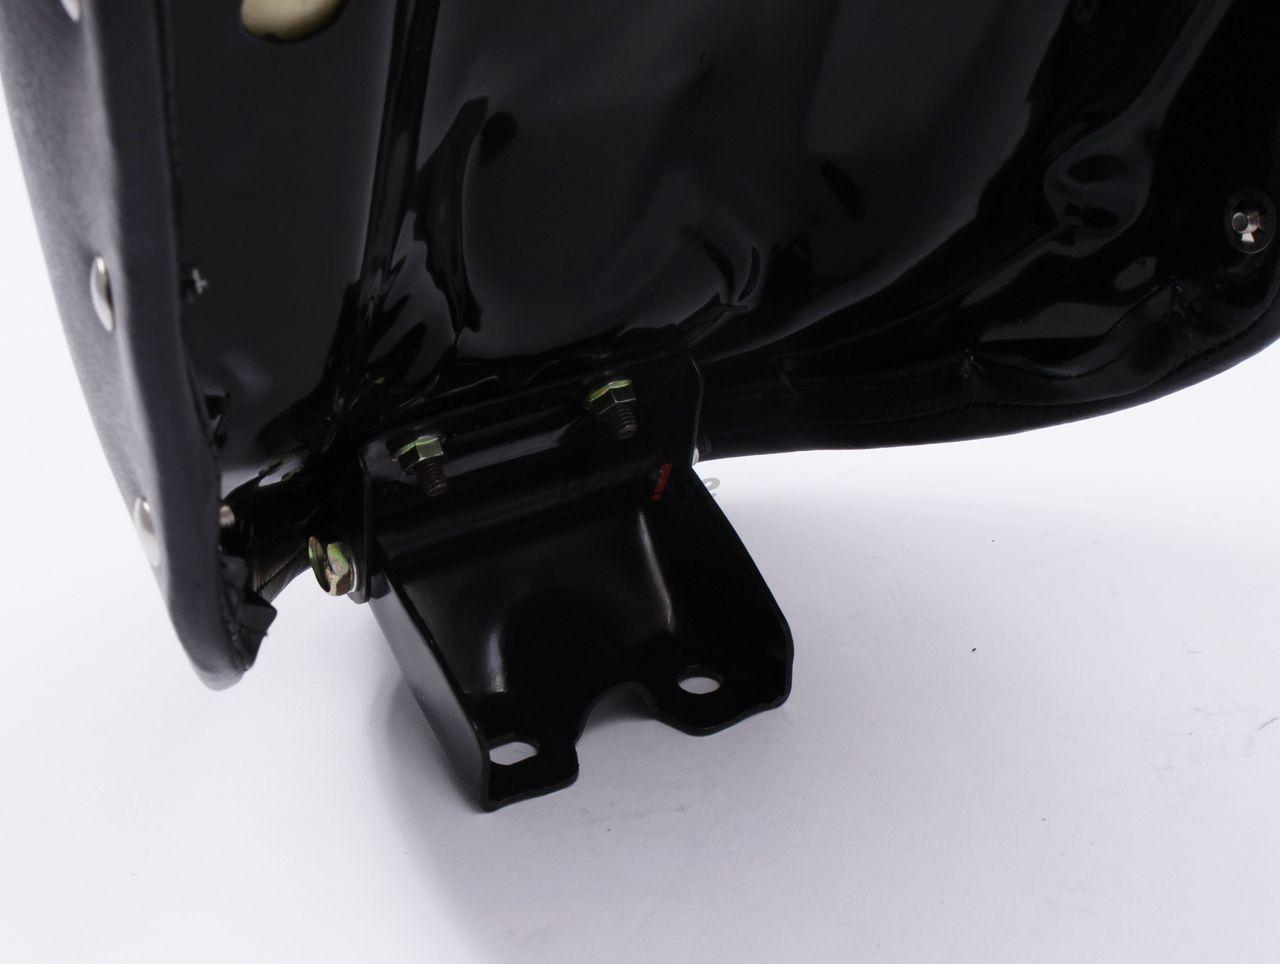 【MINIMOTO】原廠型DAX坐墊 黑色 - 「Webike-摩托百貨」